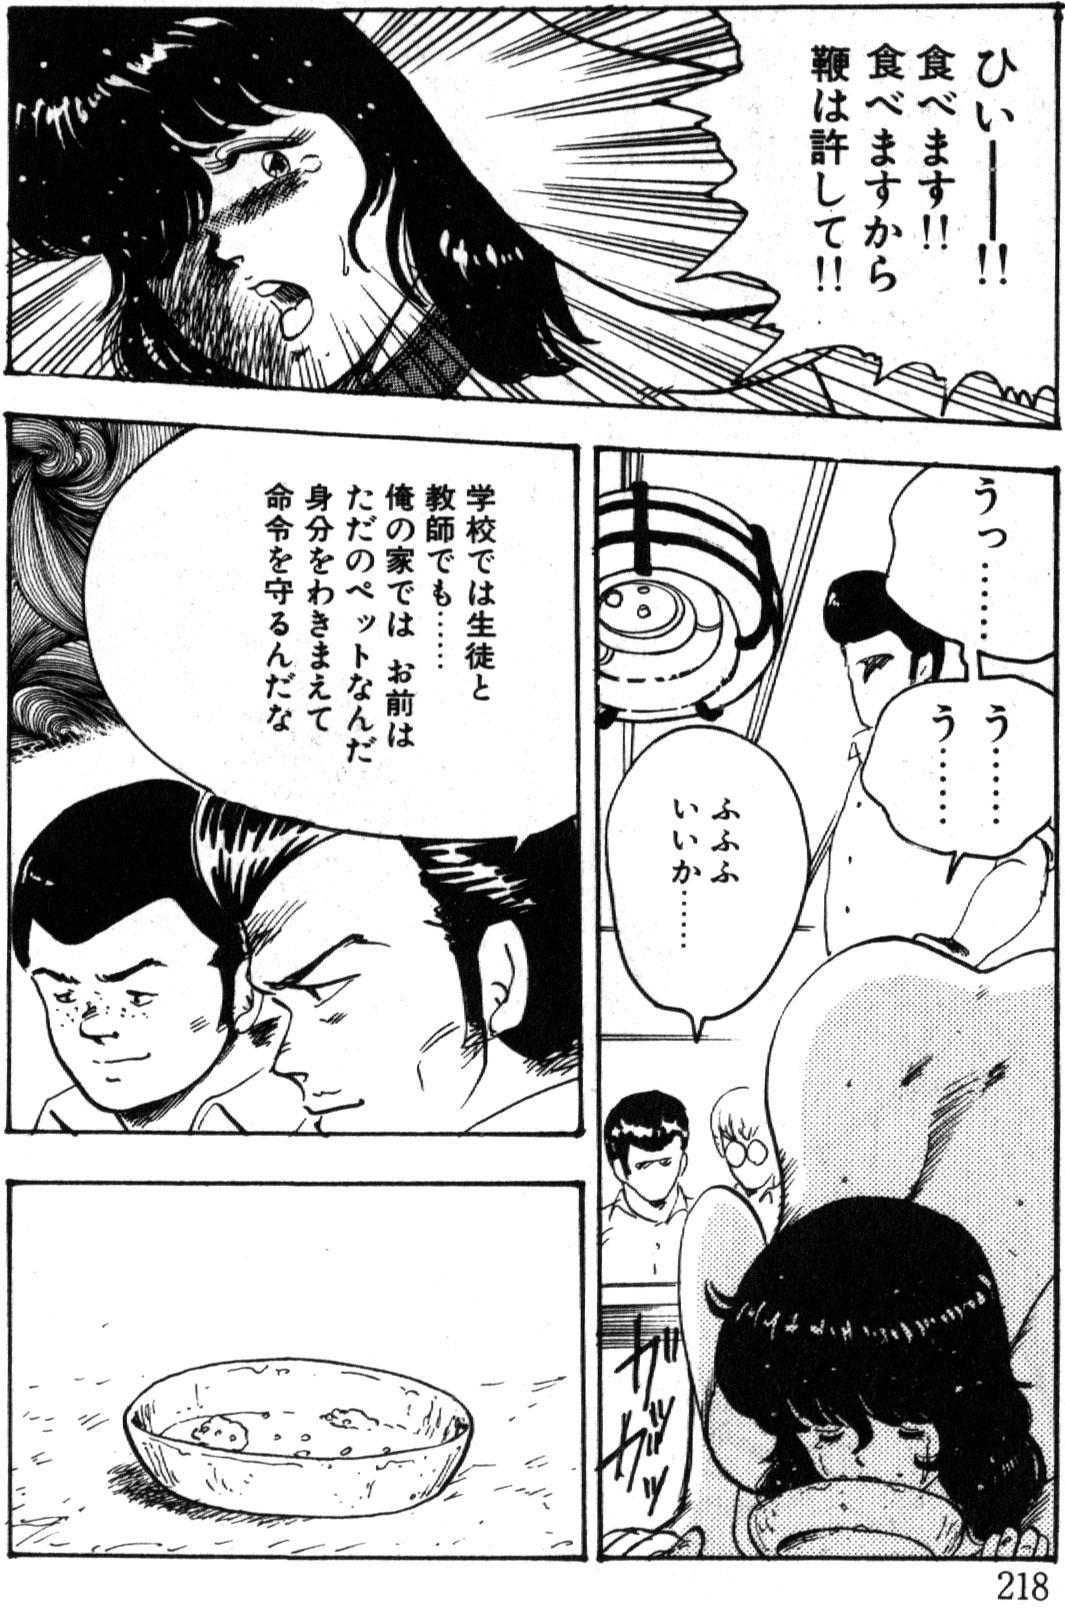 Keiko Sensei no Kagai Jugyou - Keiko Sensei Series 1 217